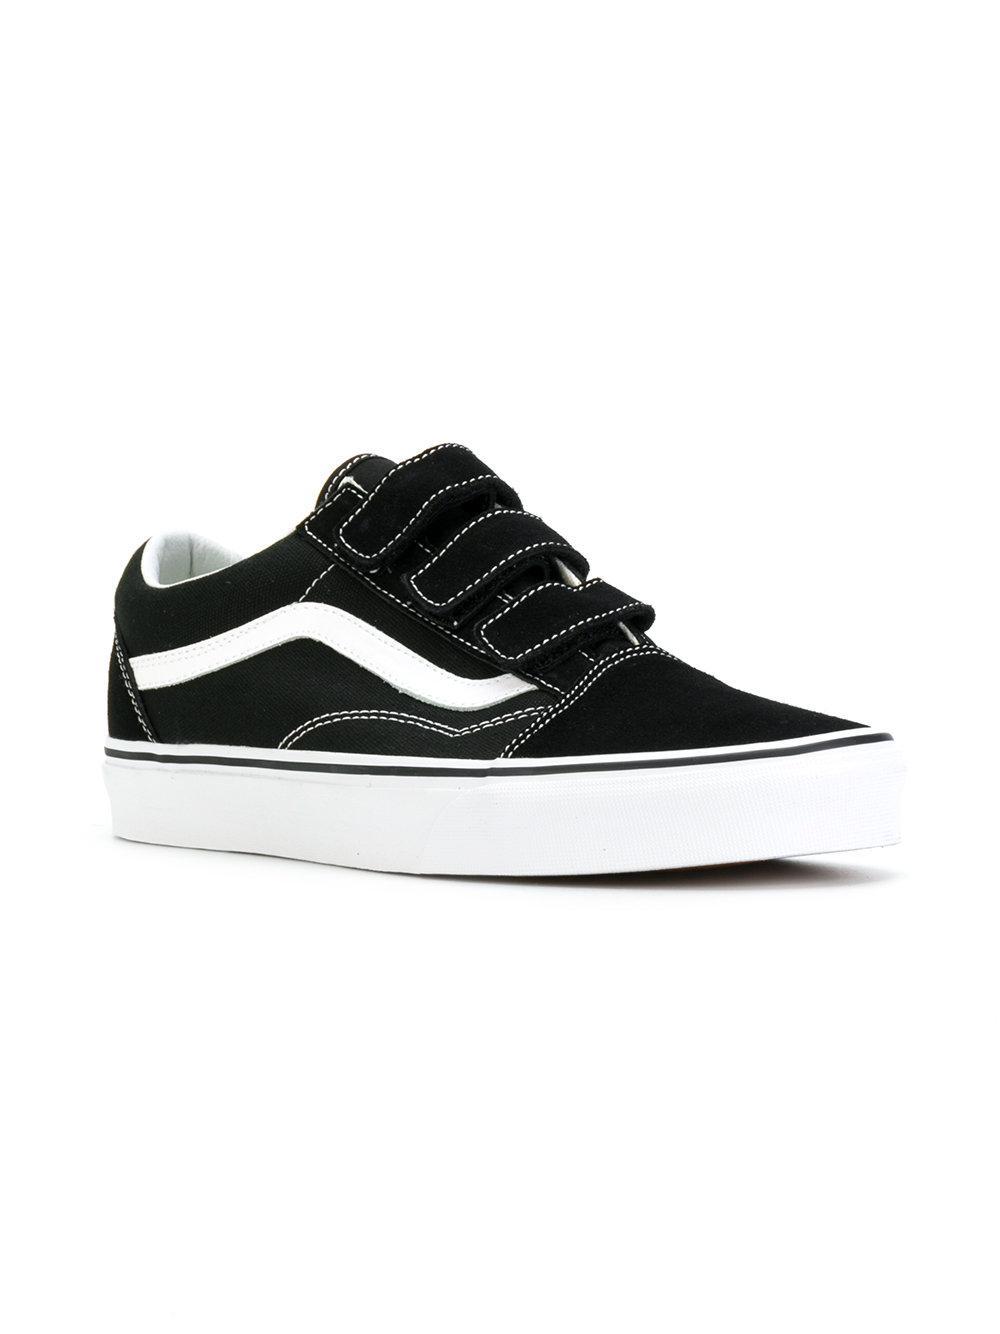 Lyst - Vans Old Skool Touch-strap Sneakers in Black for Men 30018e104